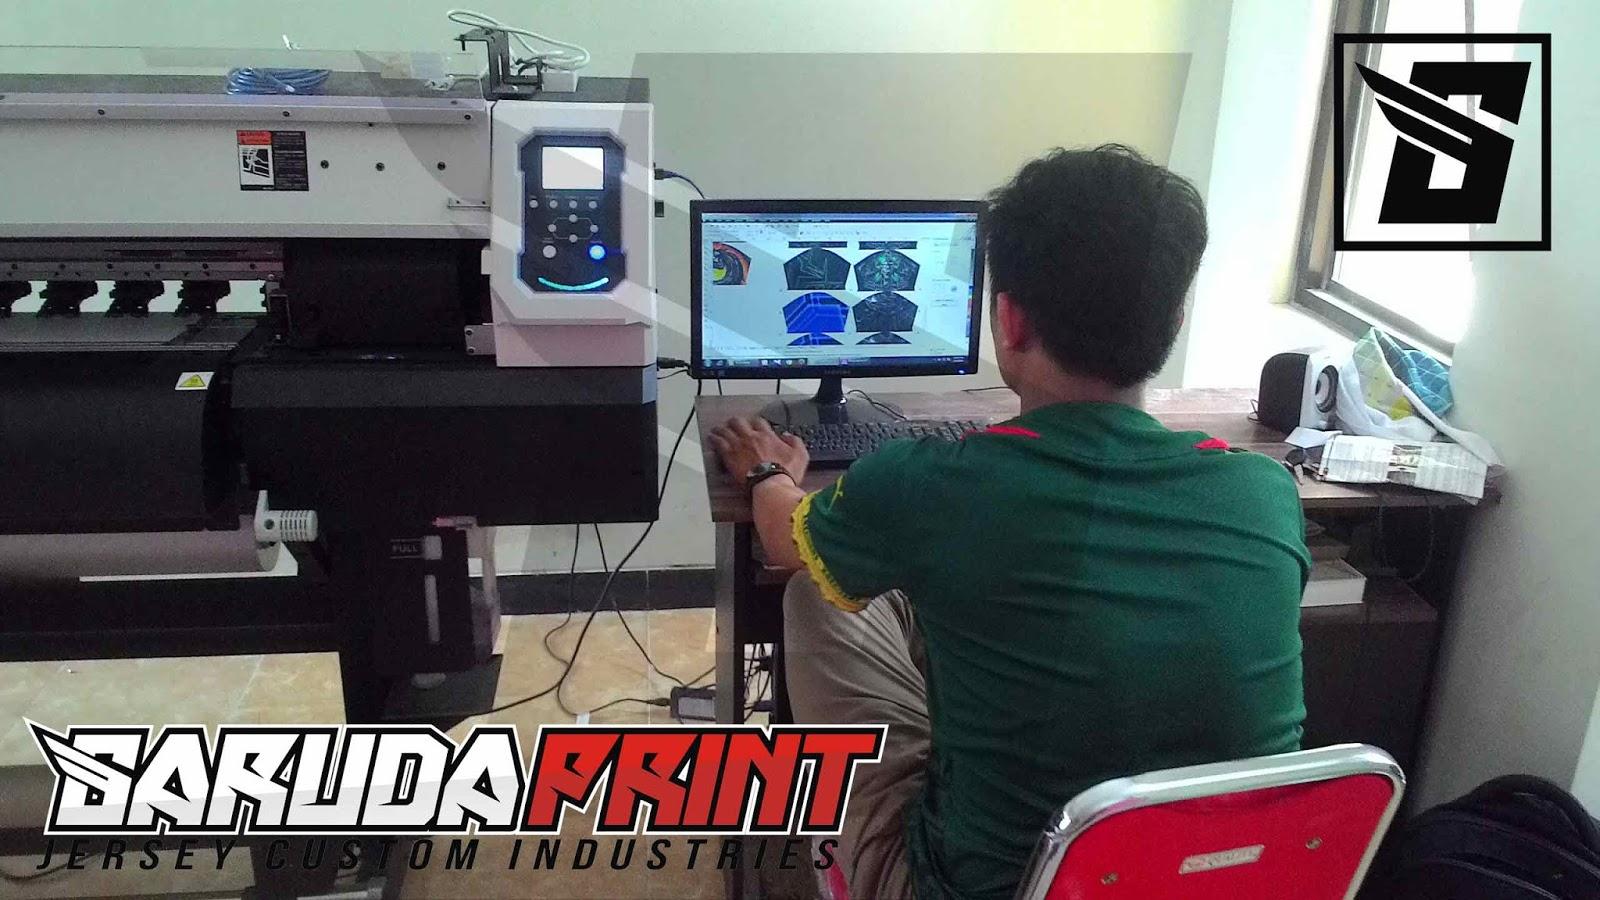 Proses Produksi Bikin Jersey Futsal Kostum Pembuatan Jasa Printing Bola Kaos Racing